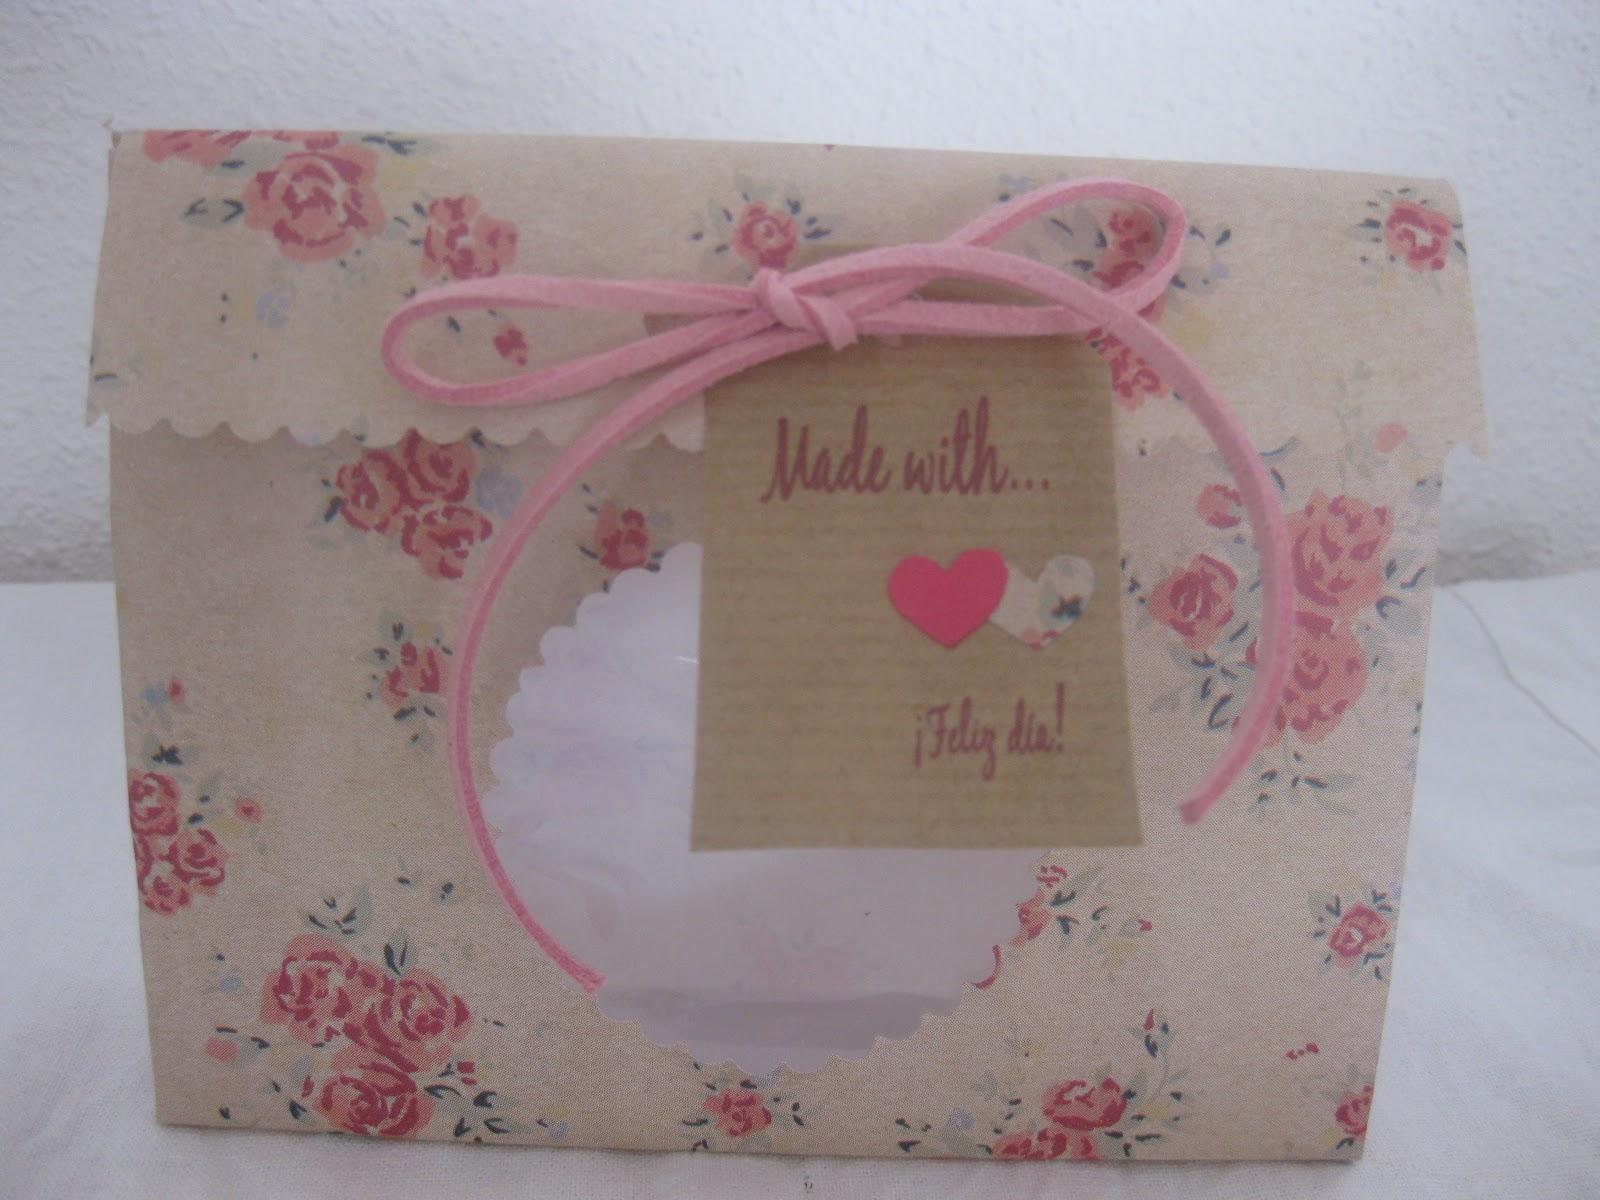 C mo hacer bolsas de papel para regalo dulce emma - Como hacer bolsas de regalo ...